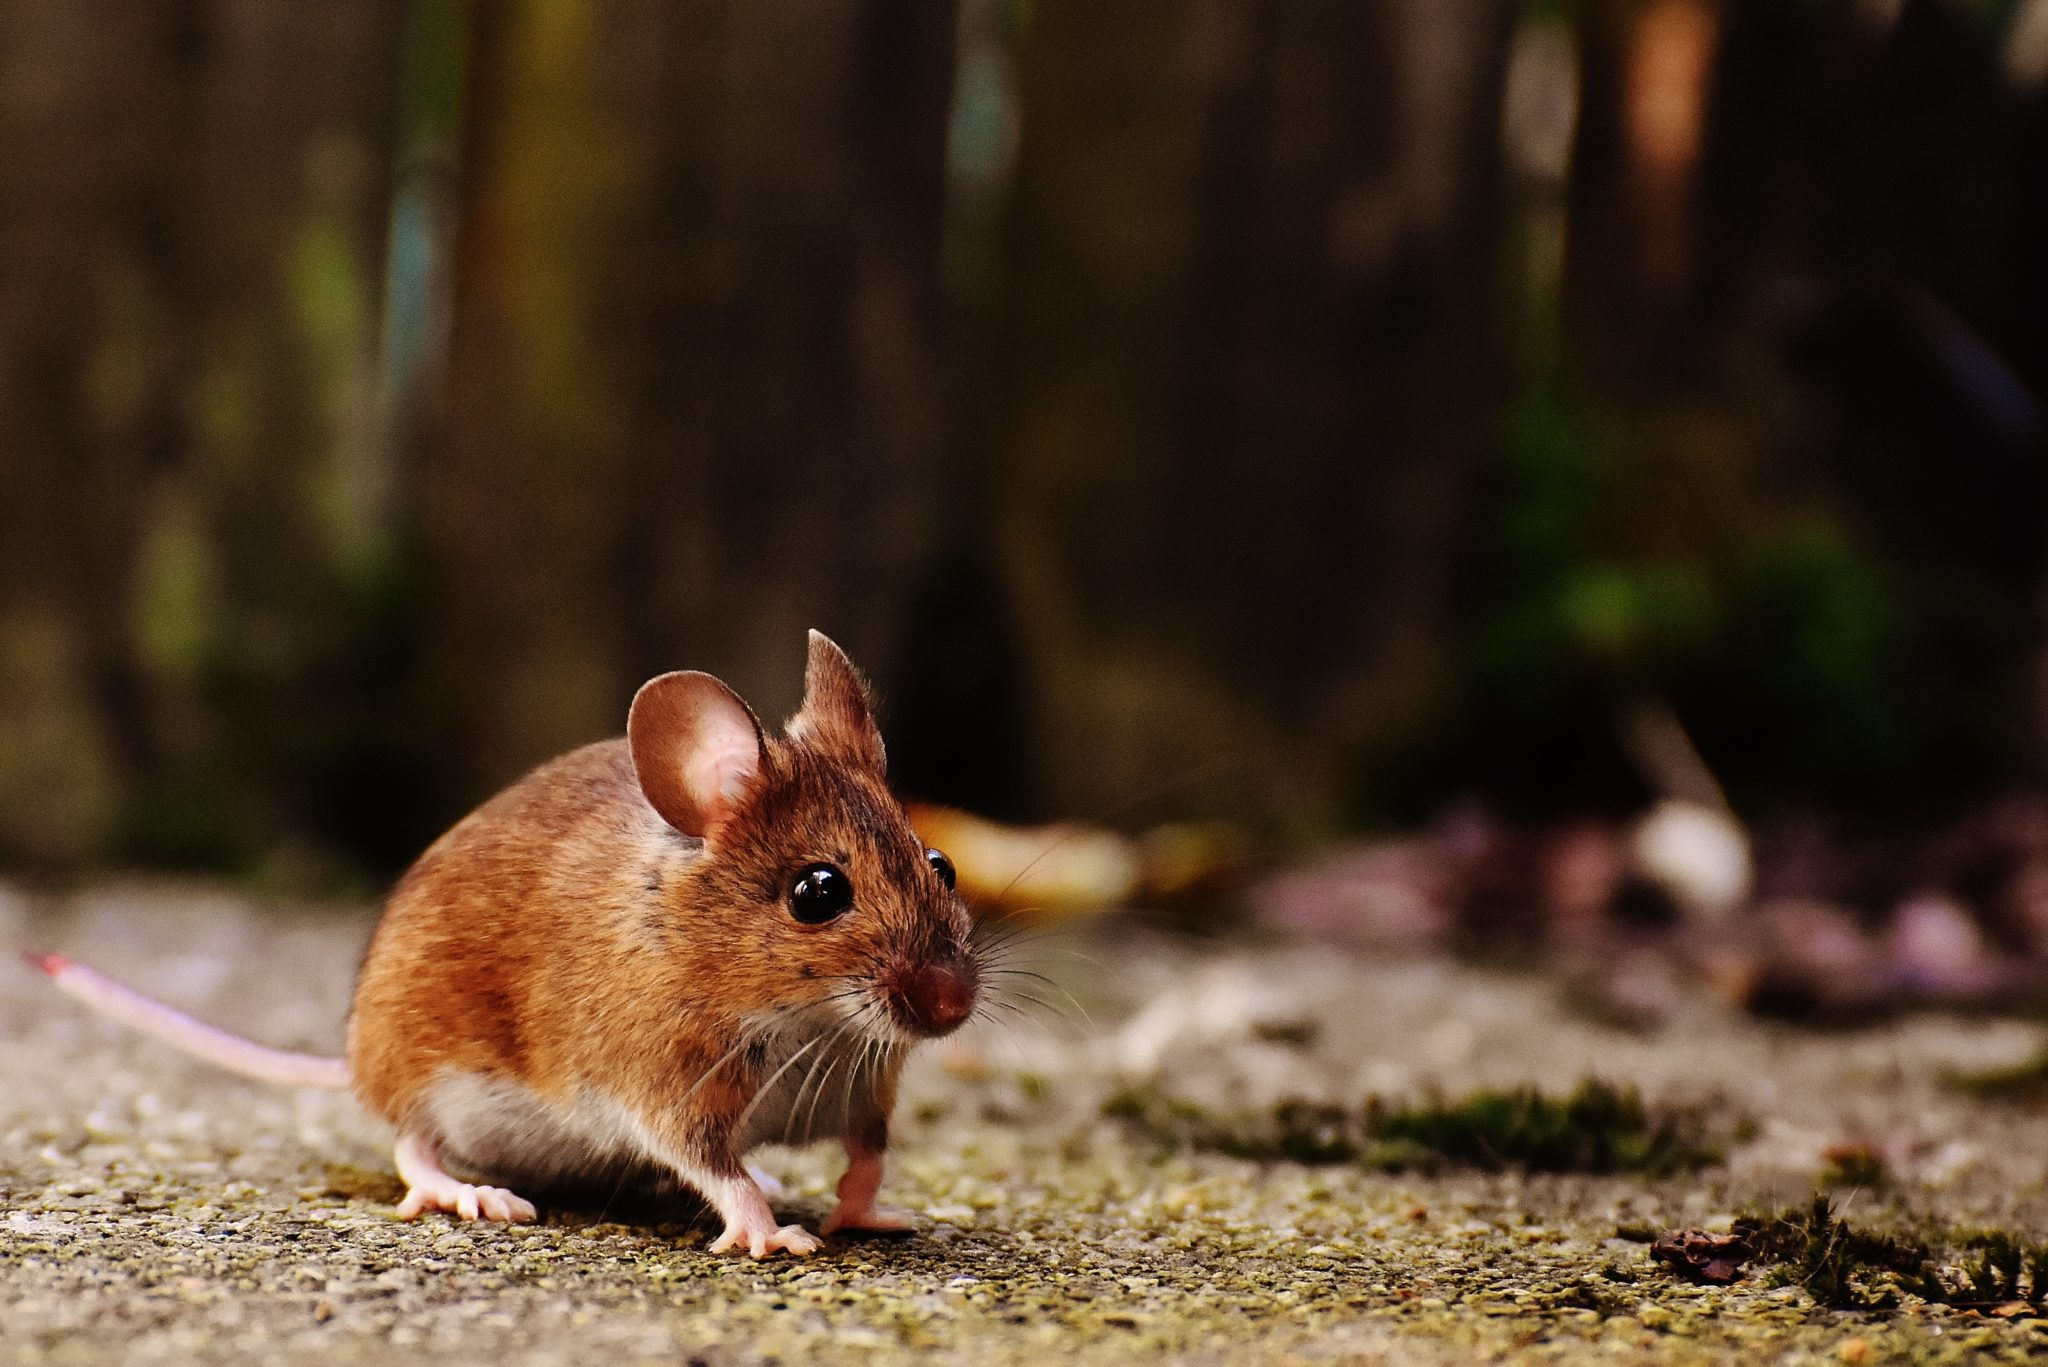 souris brune documentaire animalier